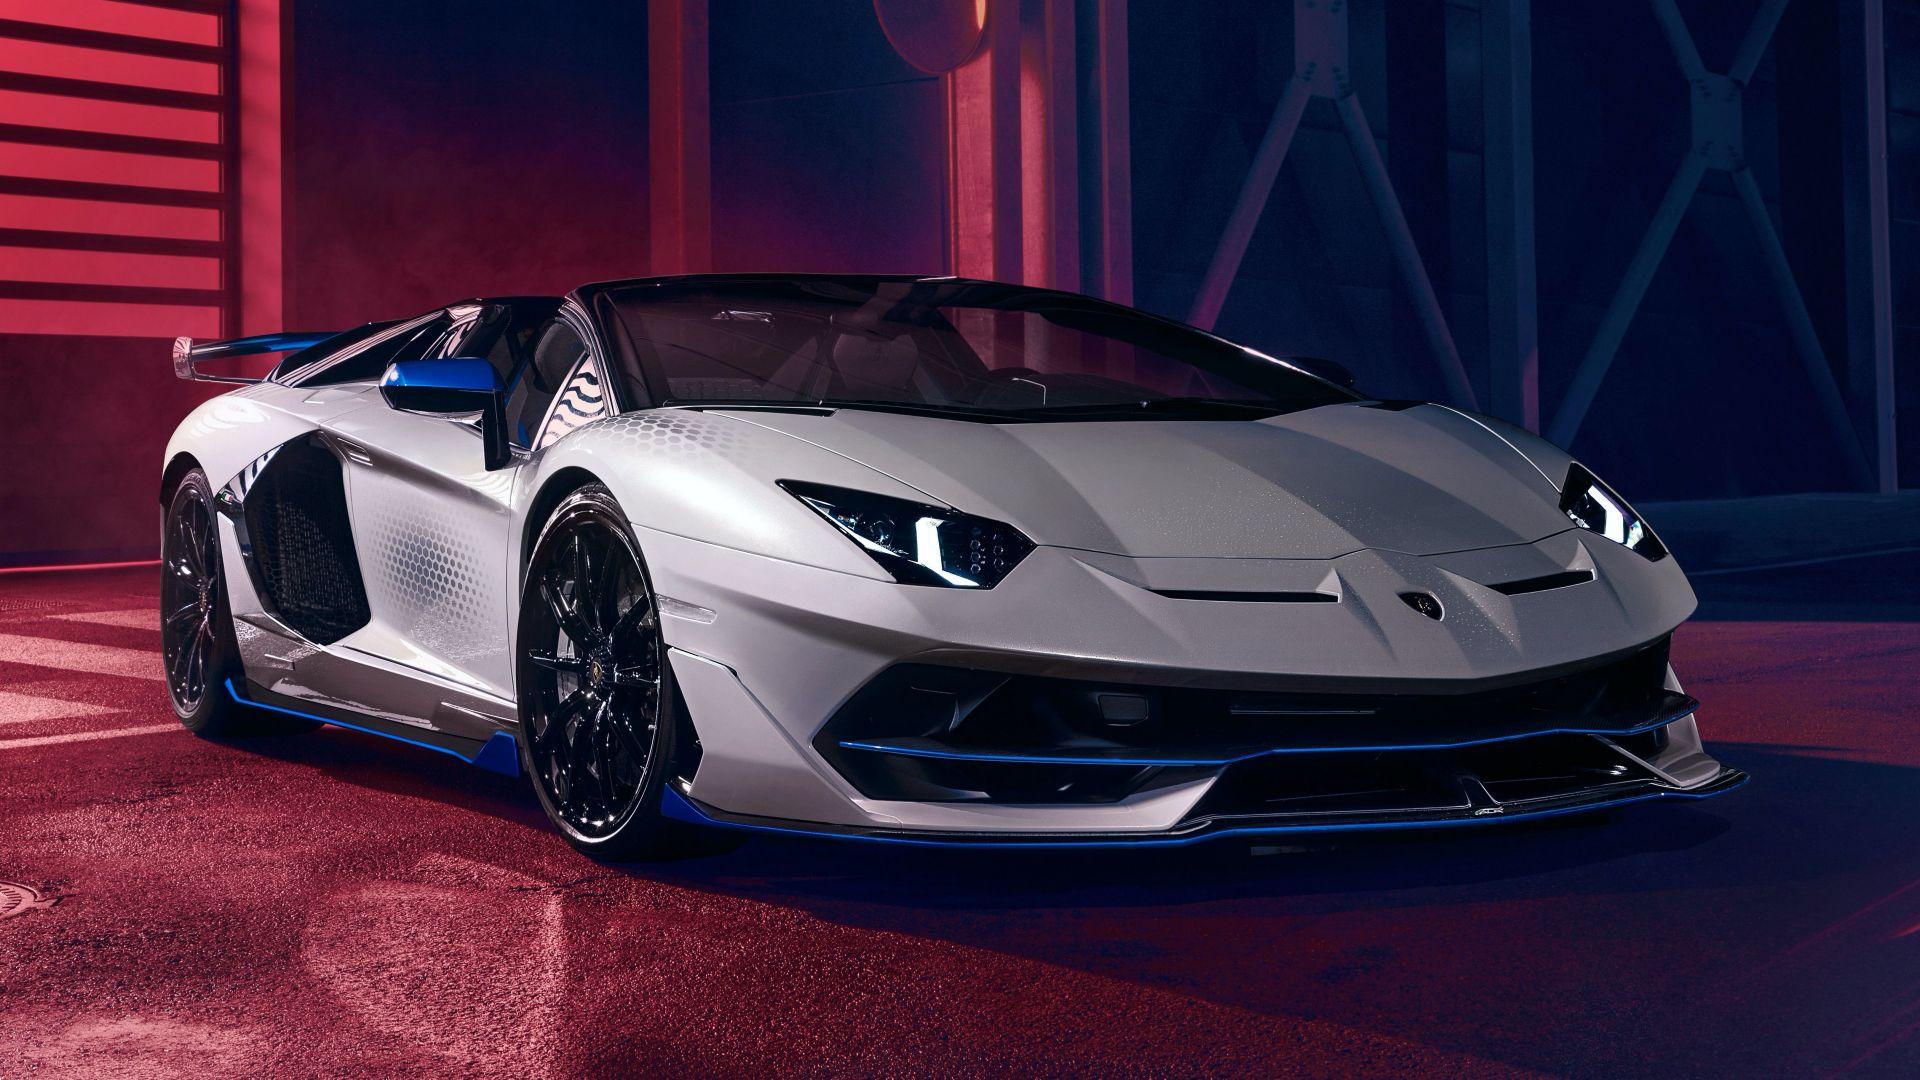 Lamborghini-Aventador-SVJ-Xago-Edition-1